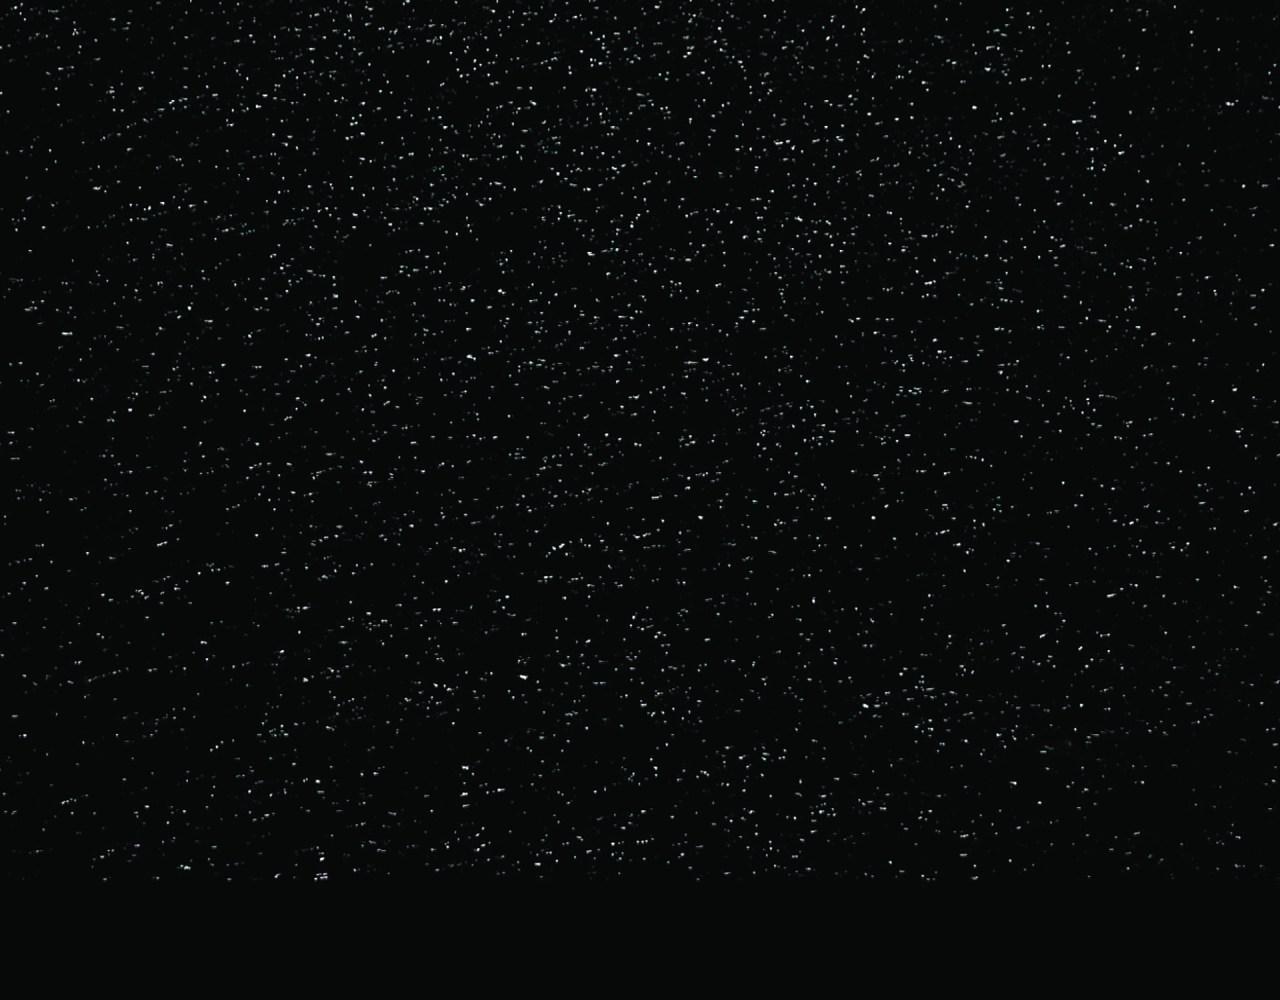 2012 lisa k. blatt video still from clearest lake in world f